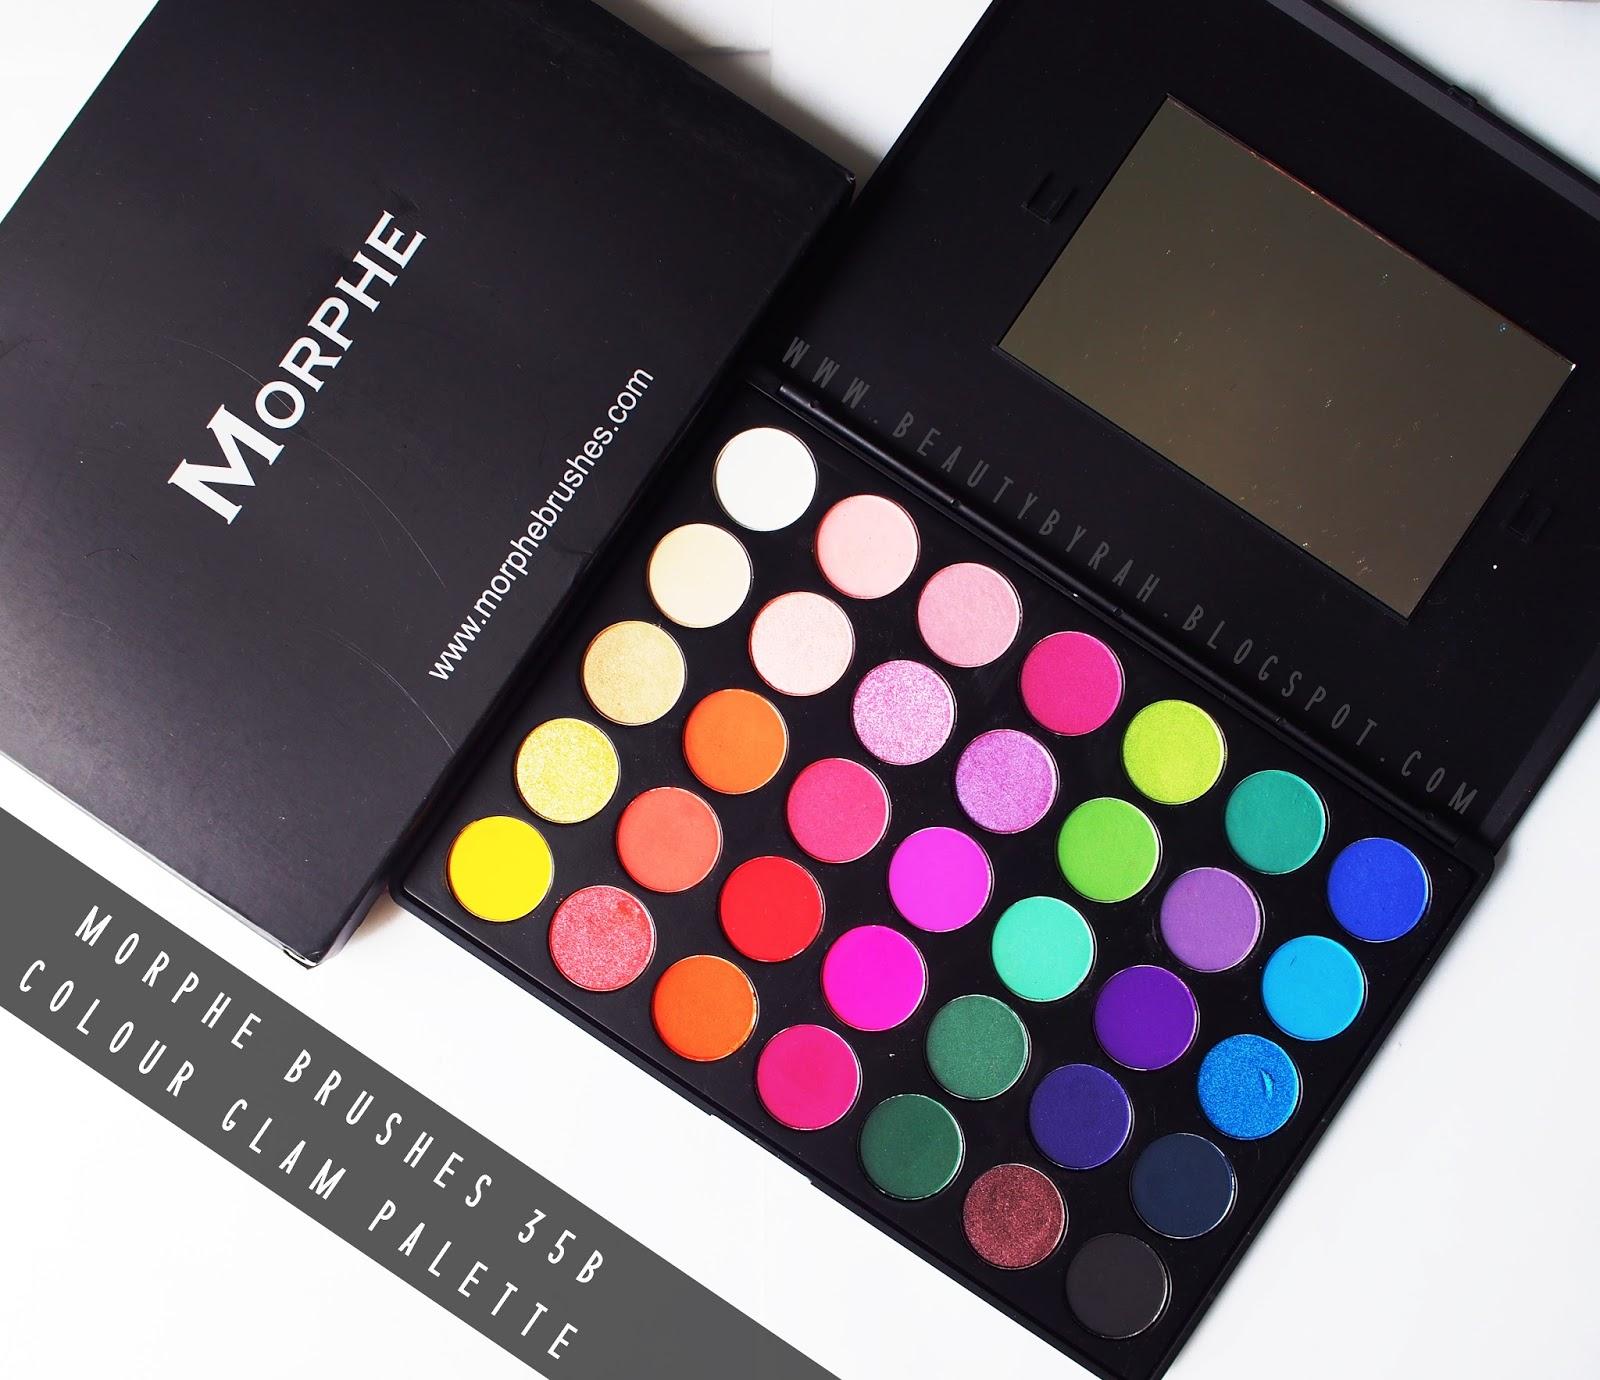 Morphe Color Koffee Palette